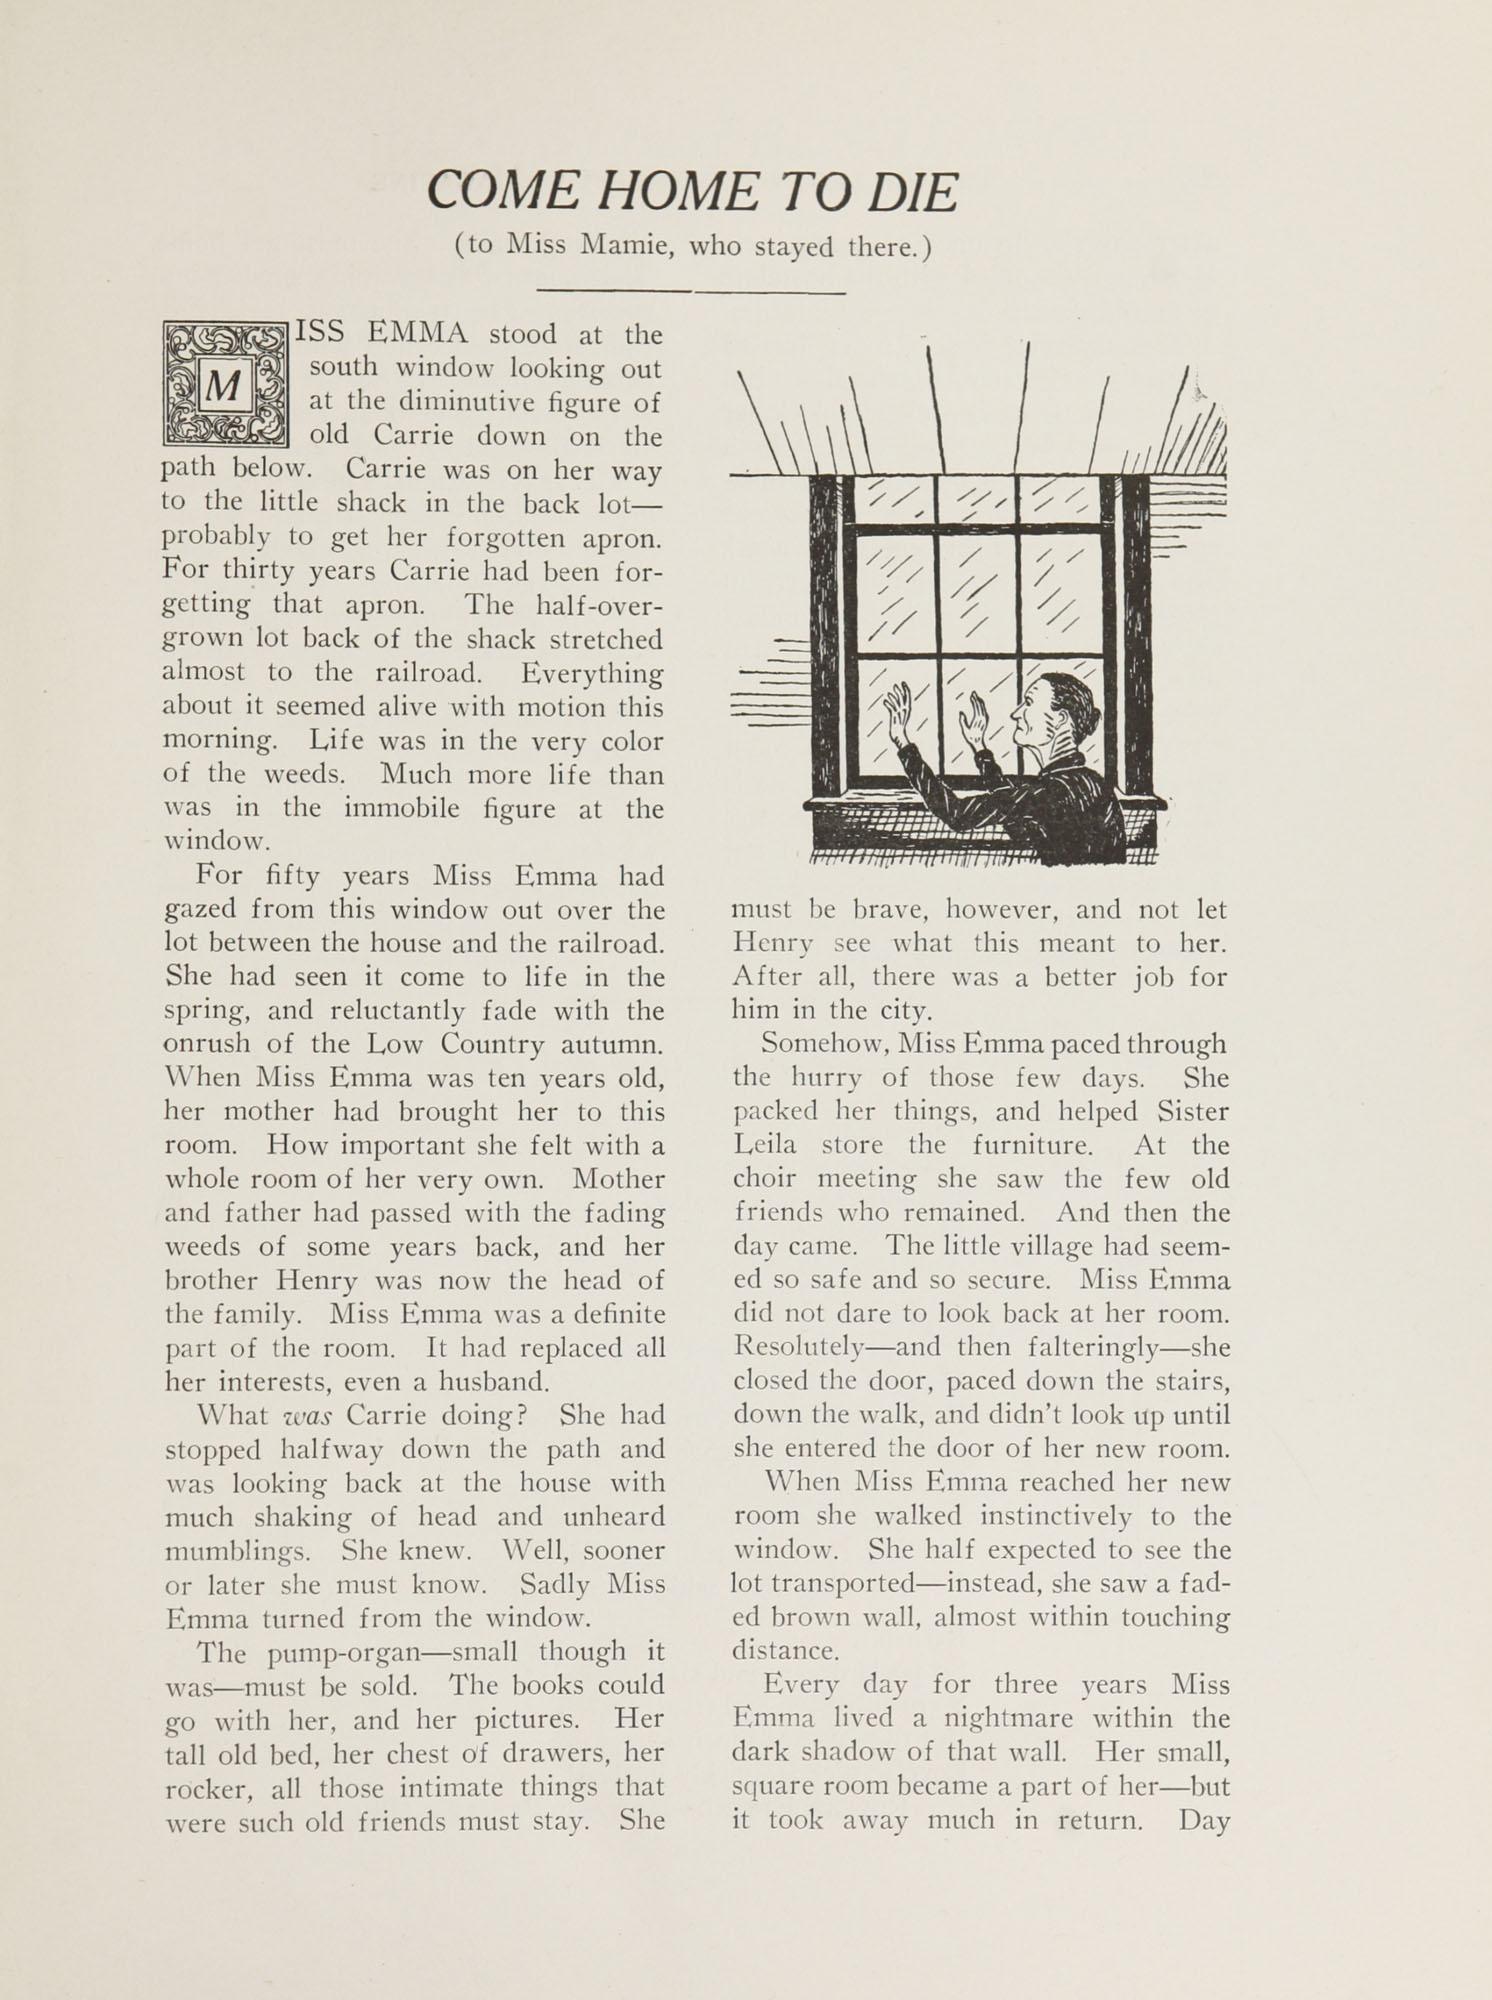 College of Charleston Magazine, 1937-1938, Vol. XXXXI No. 1, page 21